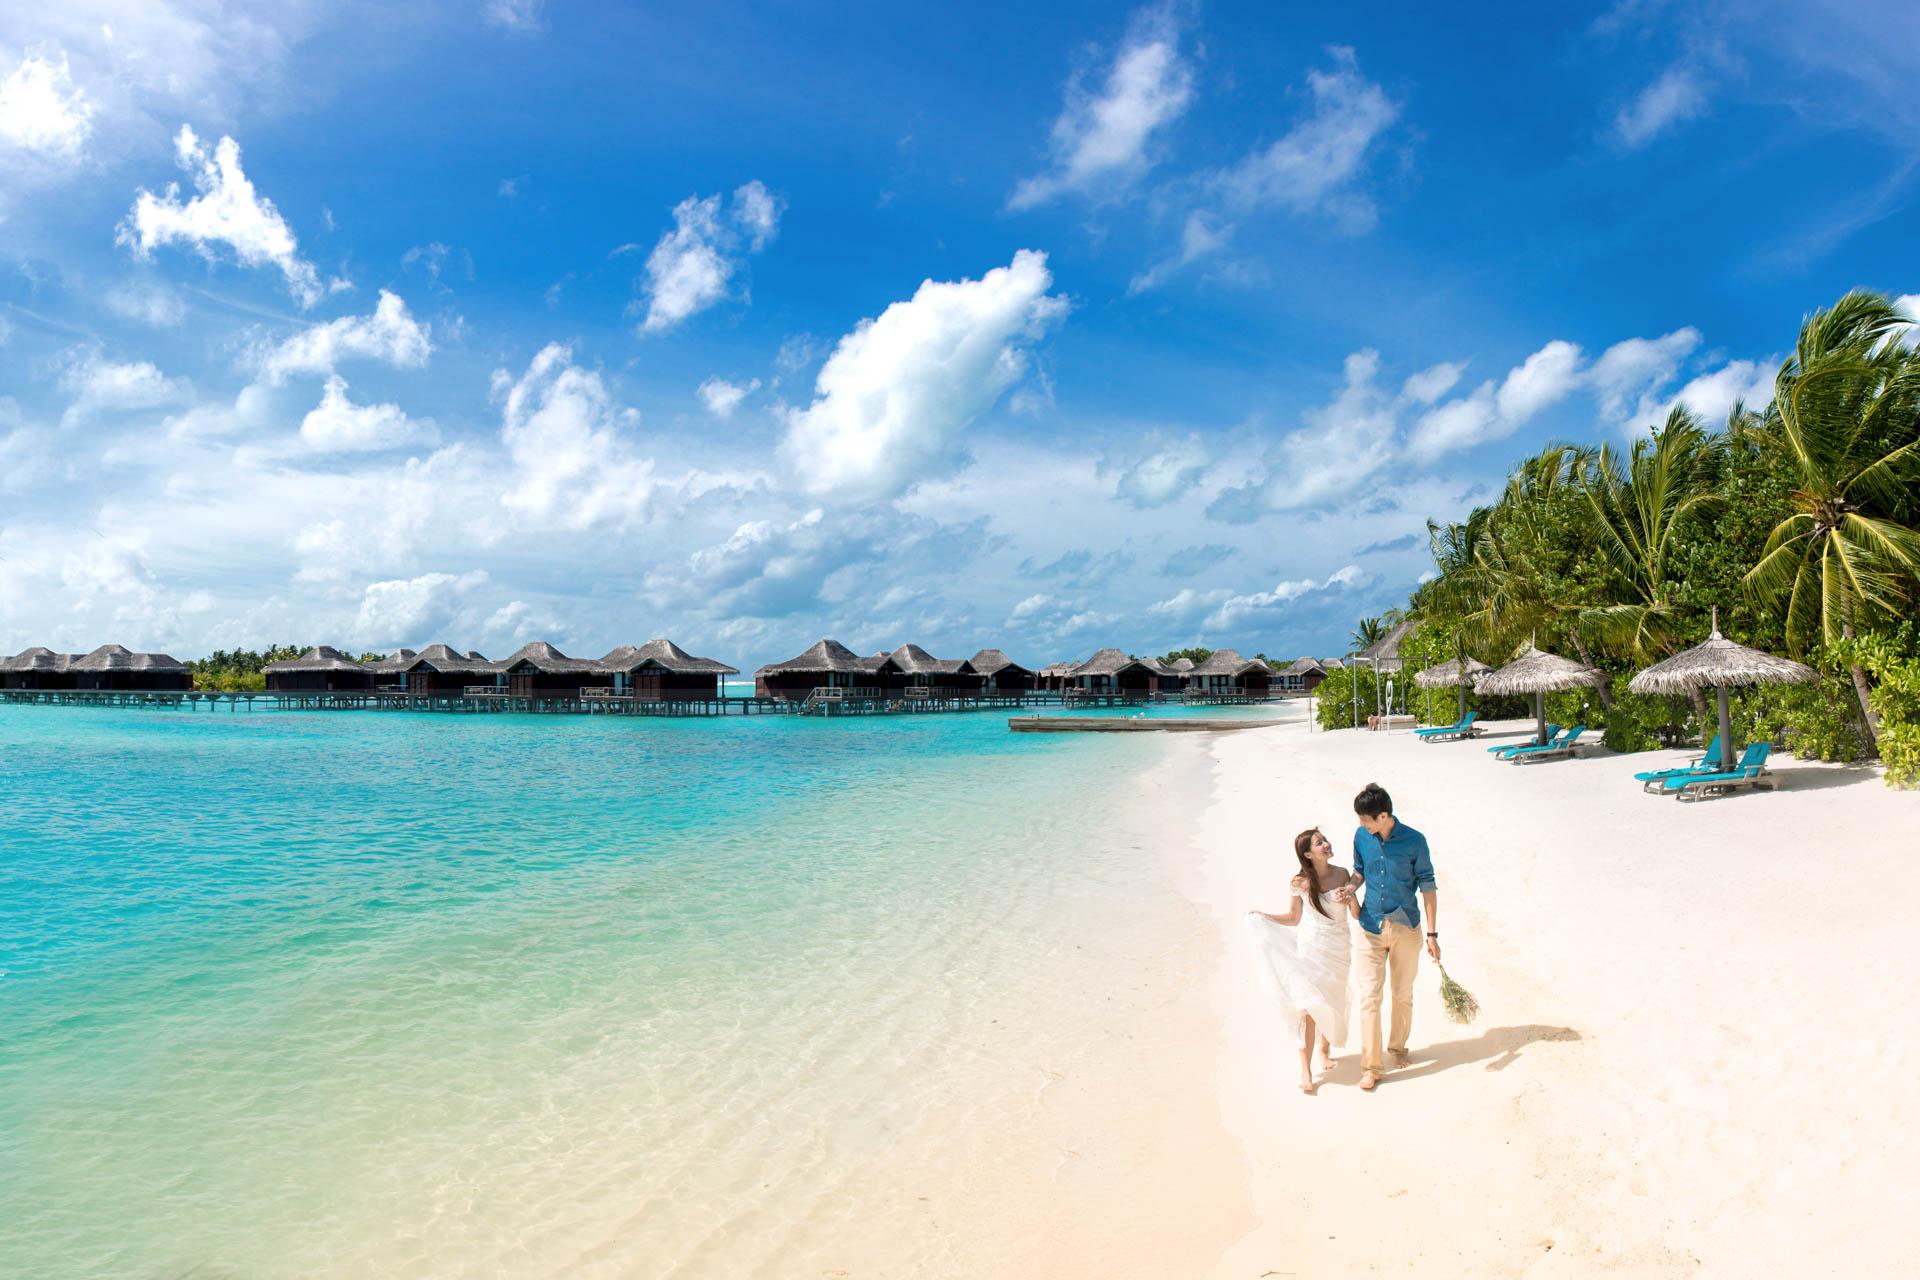 Charmy and Samson Honeymoon Photoshoot at Anantara Dhigu Veli and Naladhu Resort in Maldives by Asads Photography 6